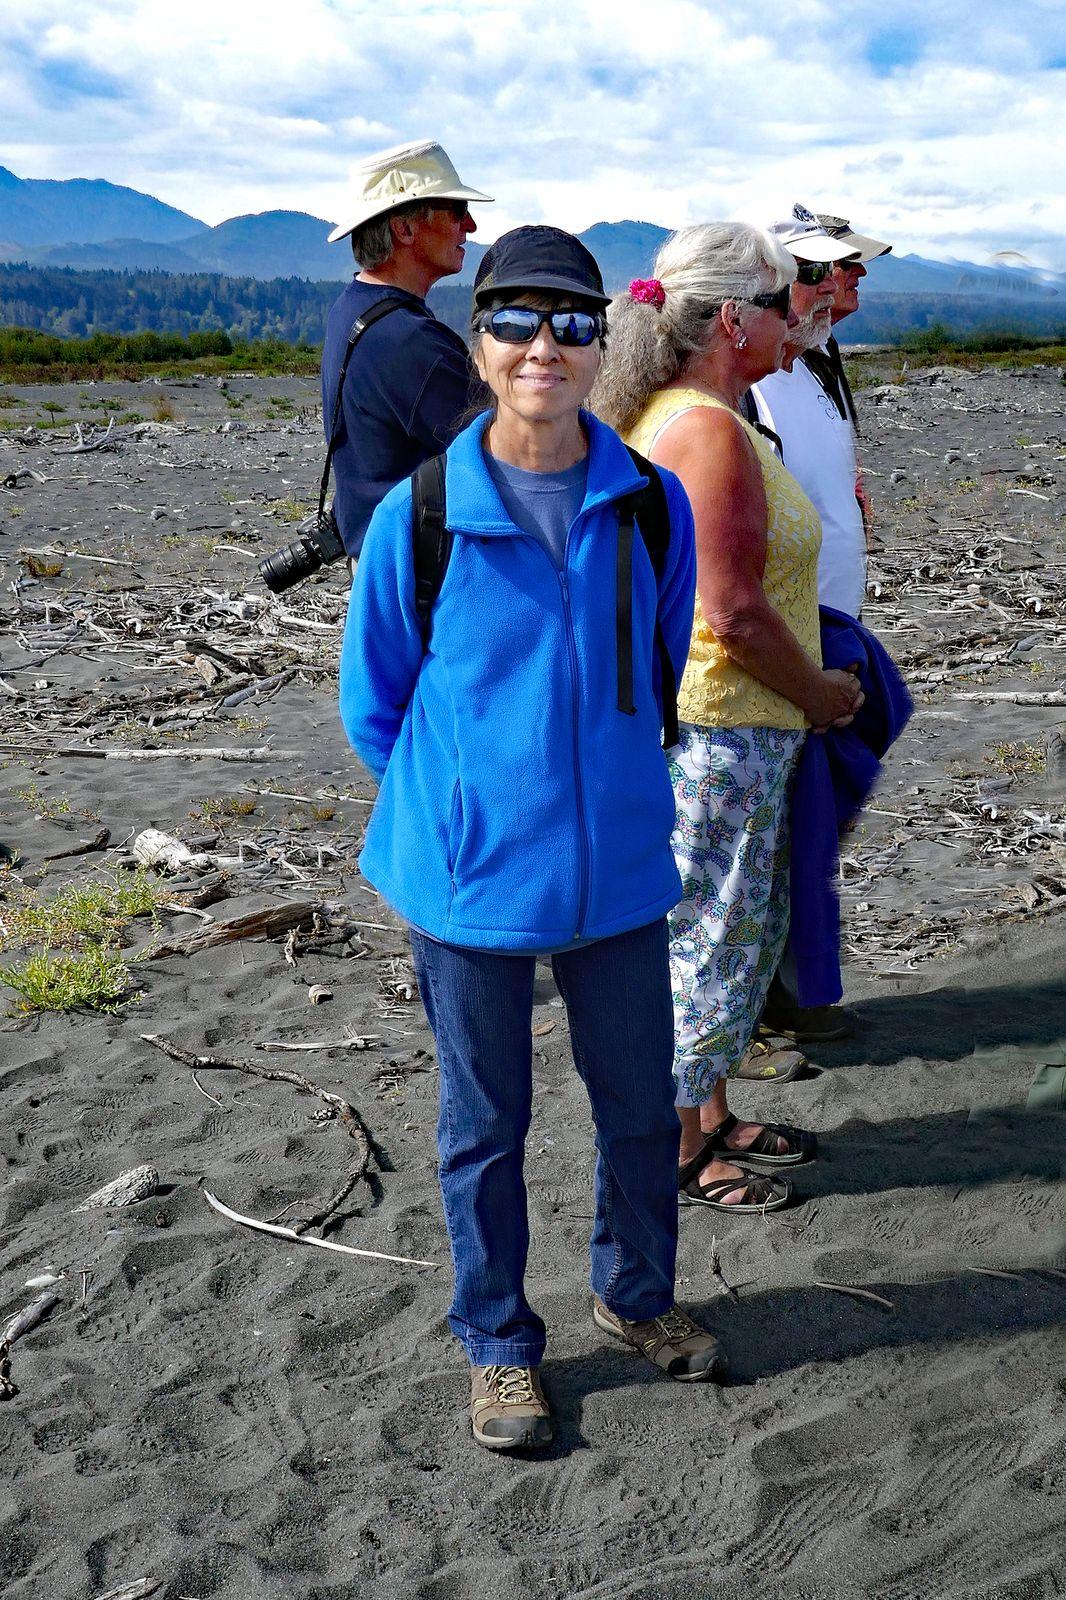 Another happy hiker Sharlene